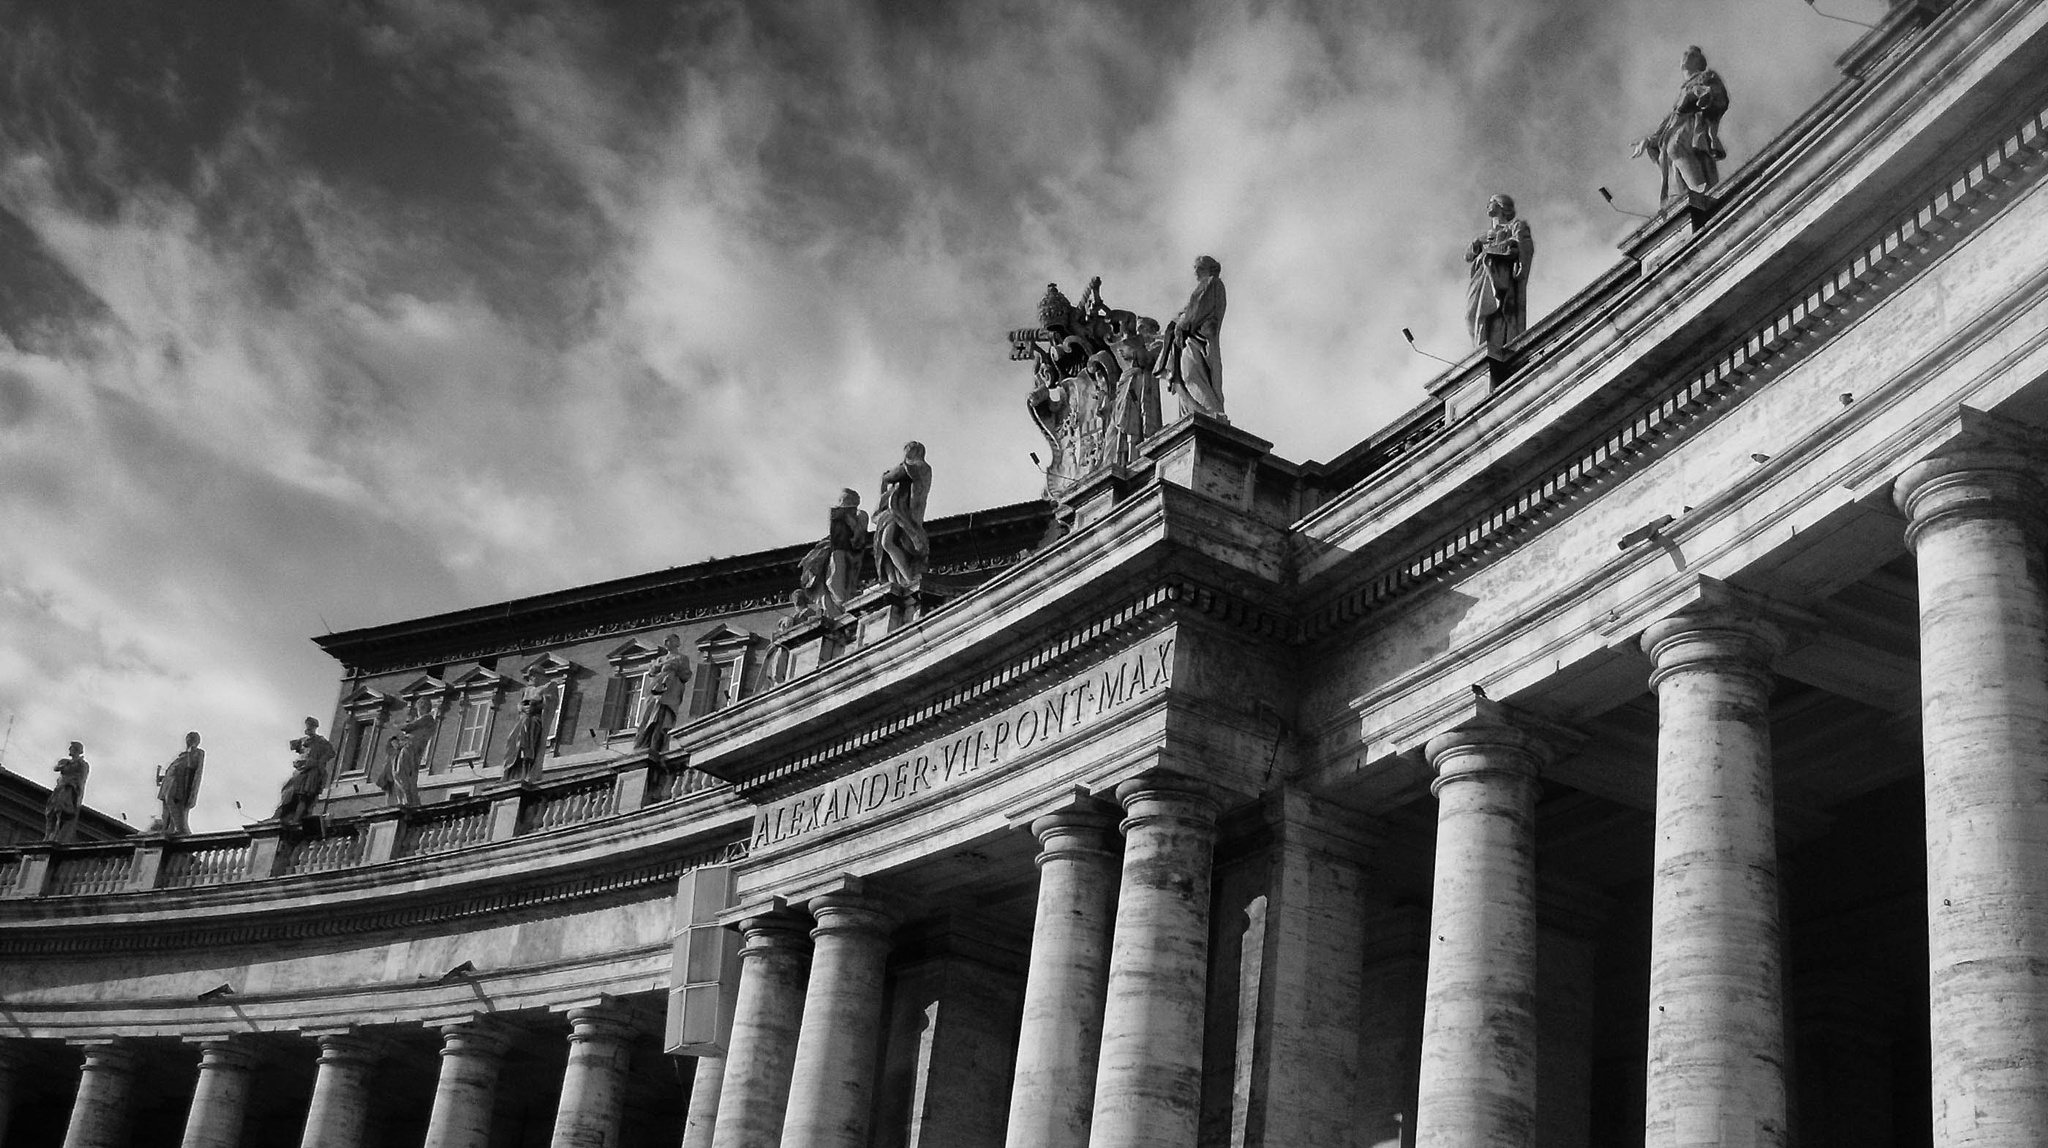 Piazza San Pietro by LuisFilipeCorreia